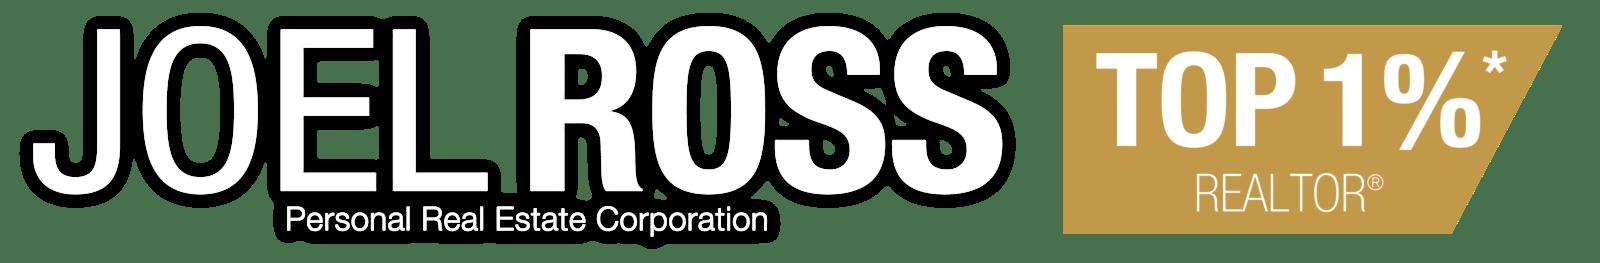 Joel Ross Personal Real Estate Corporation